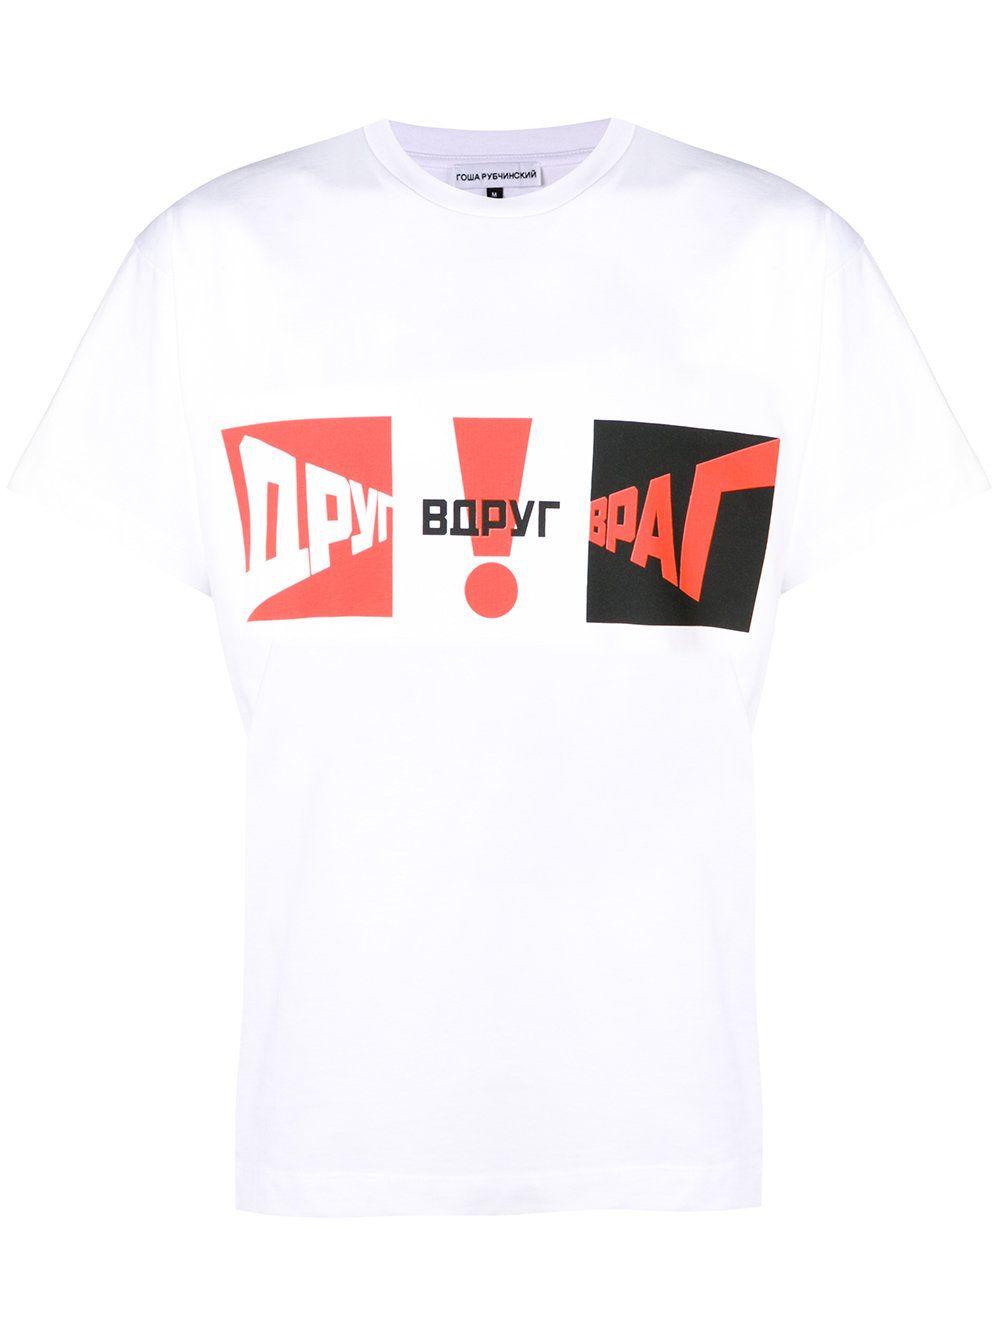 67ec0f41a69bf9 Gosha Rubchinskiy Slogan short sleeve T-shirt | T-shirts | Gosha ...